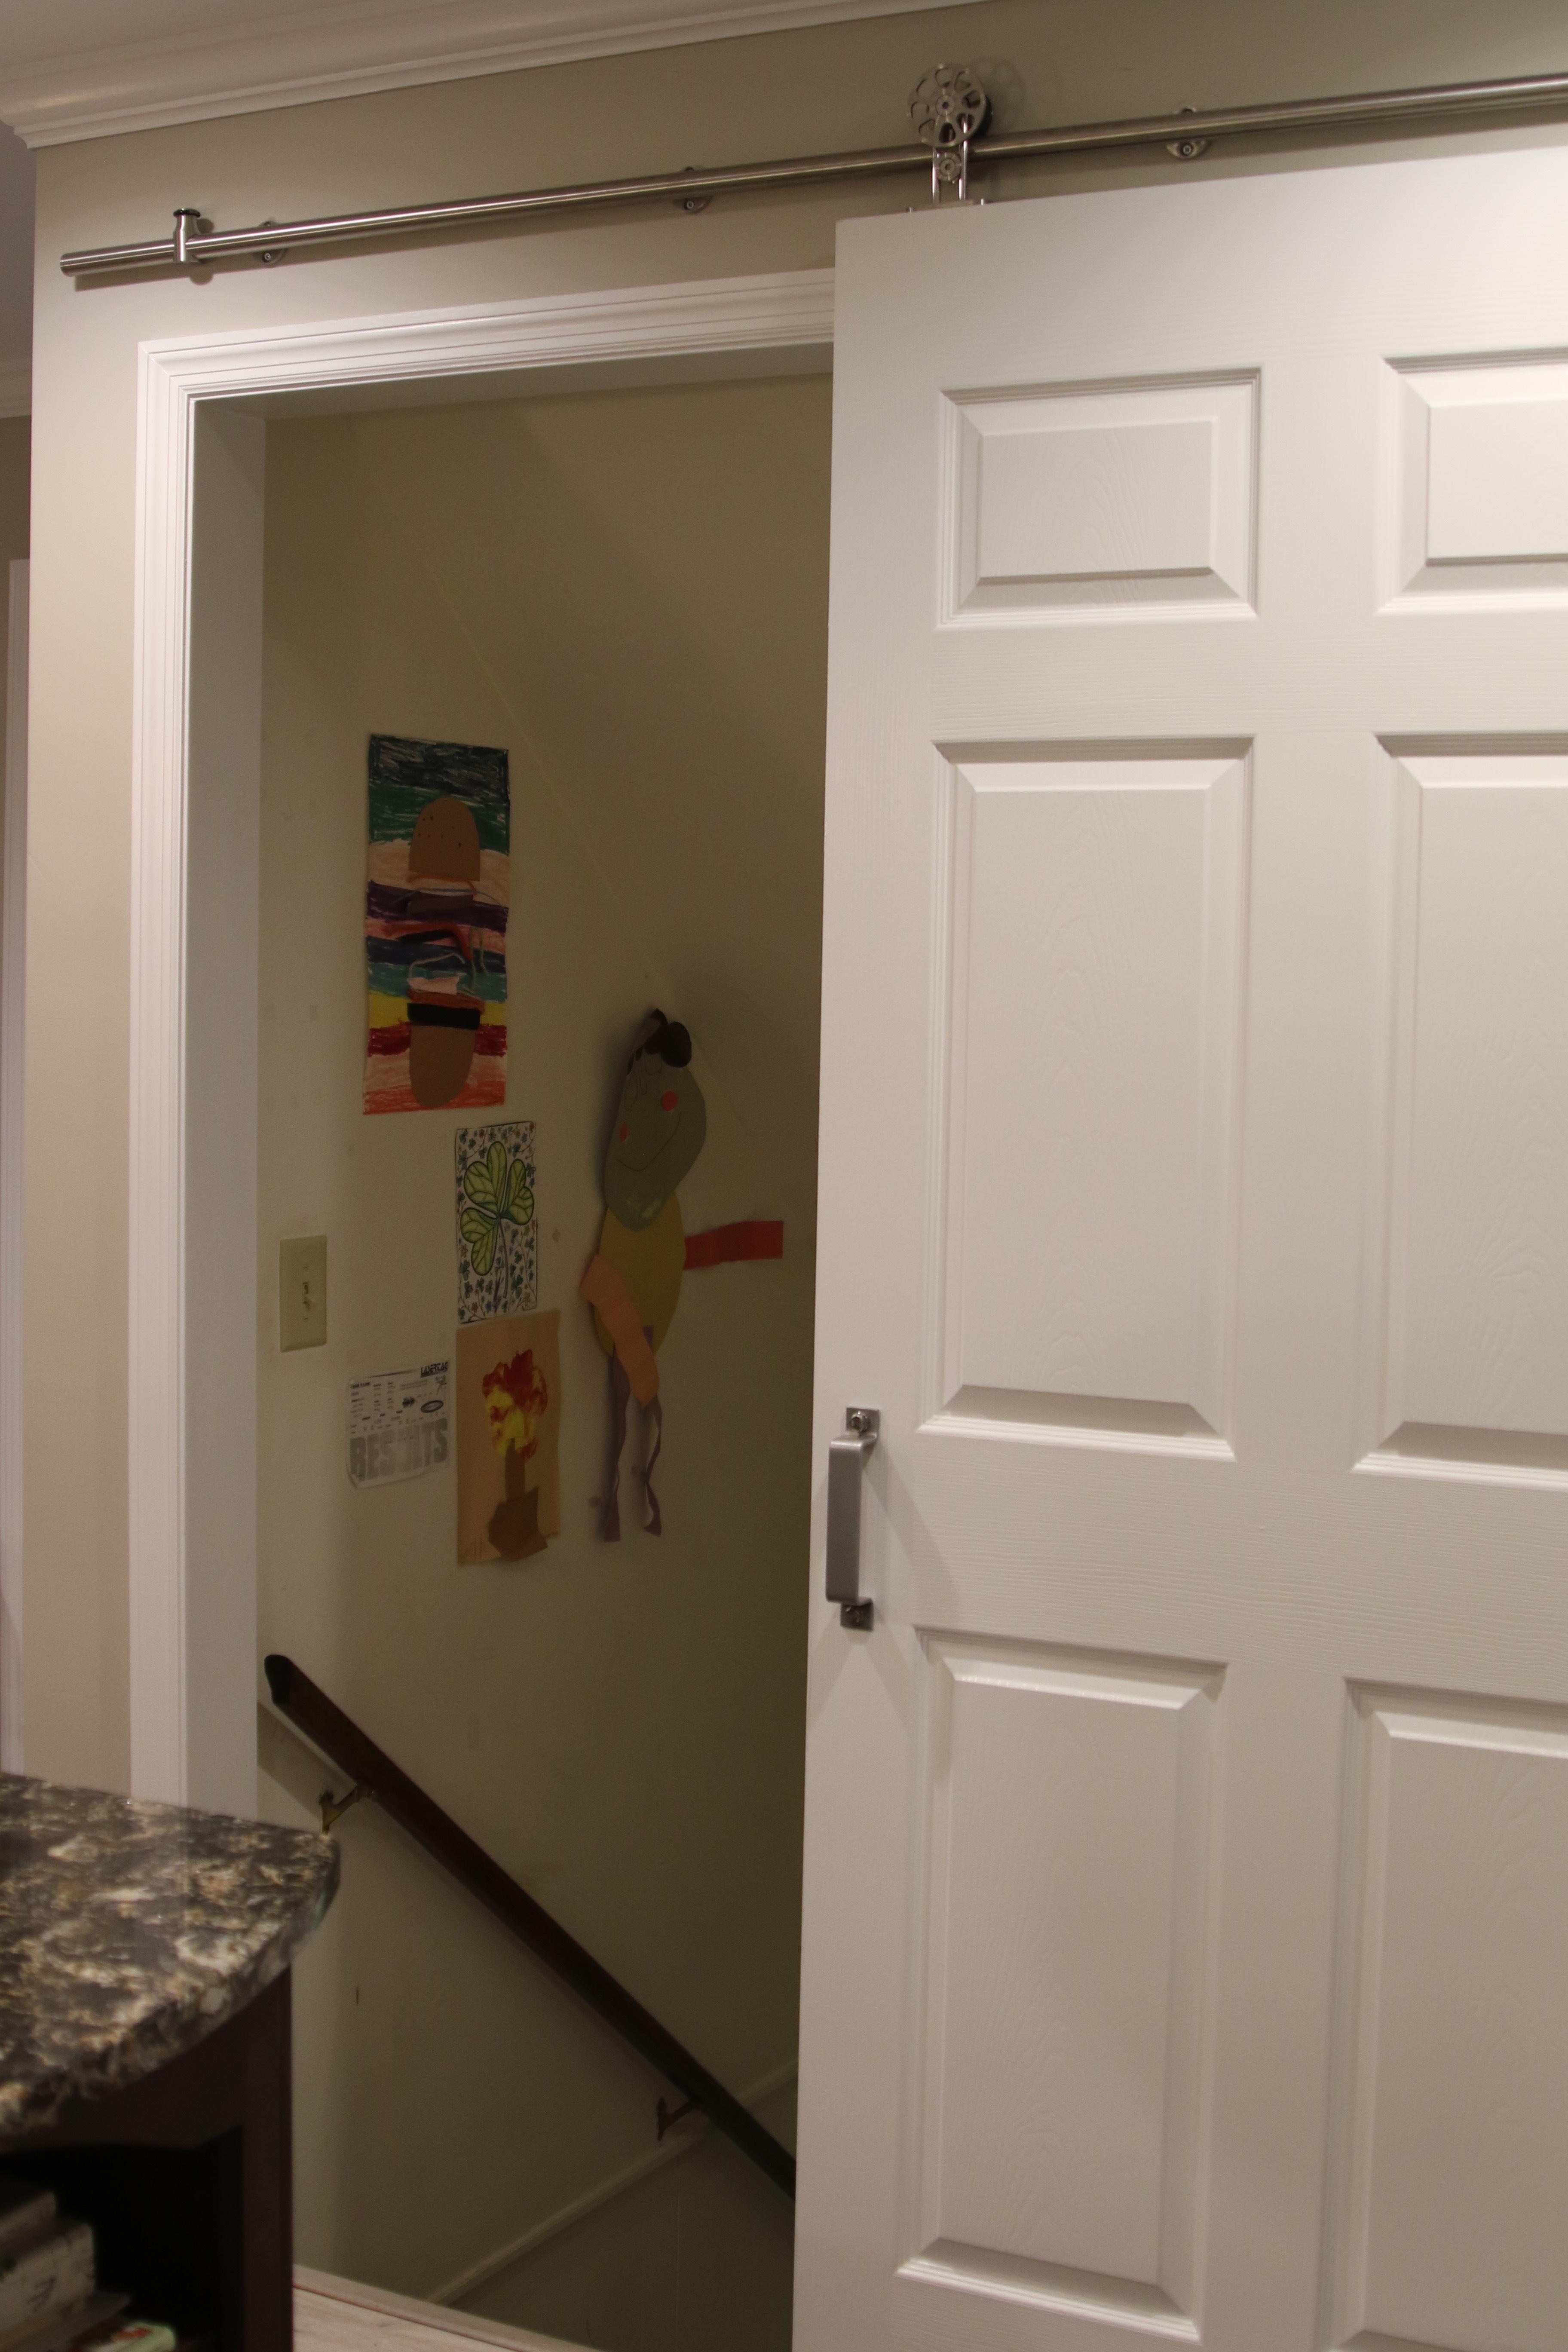 Barn Doors05-squashed